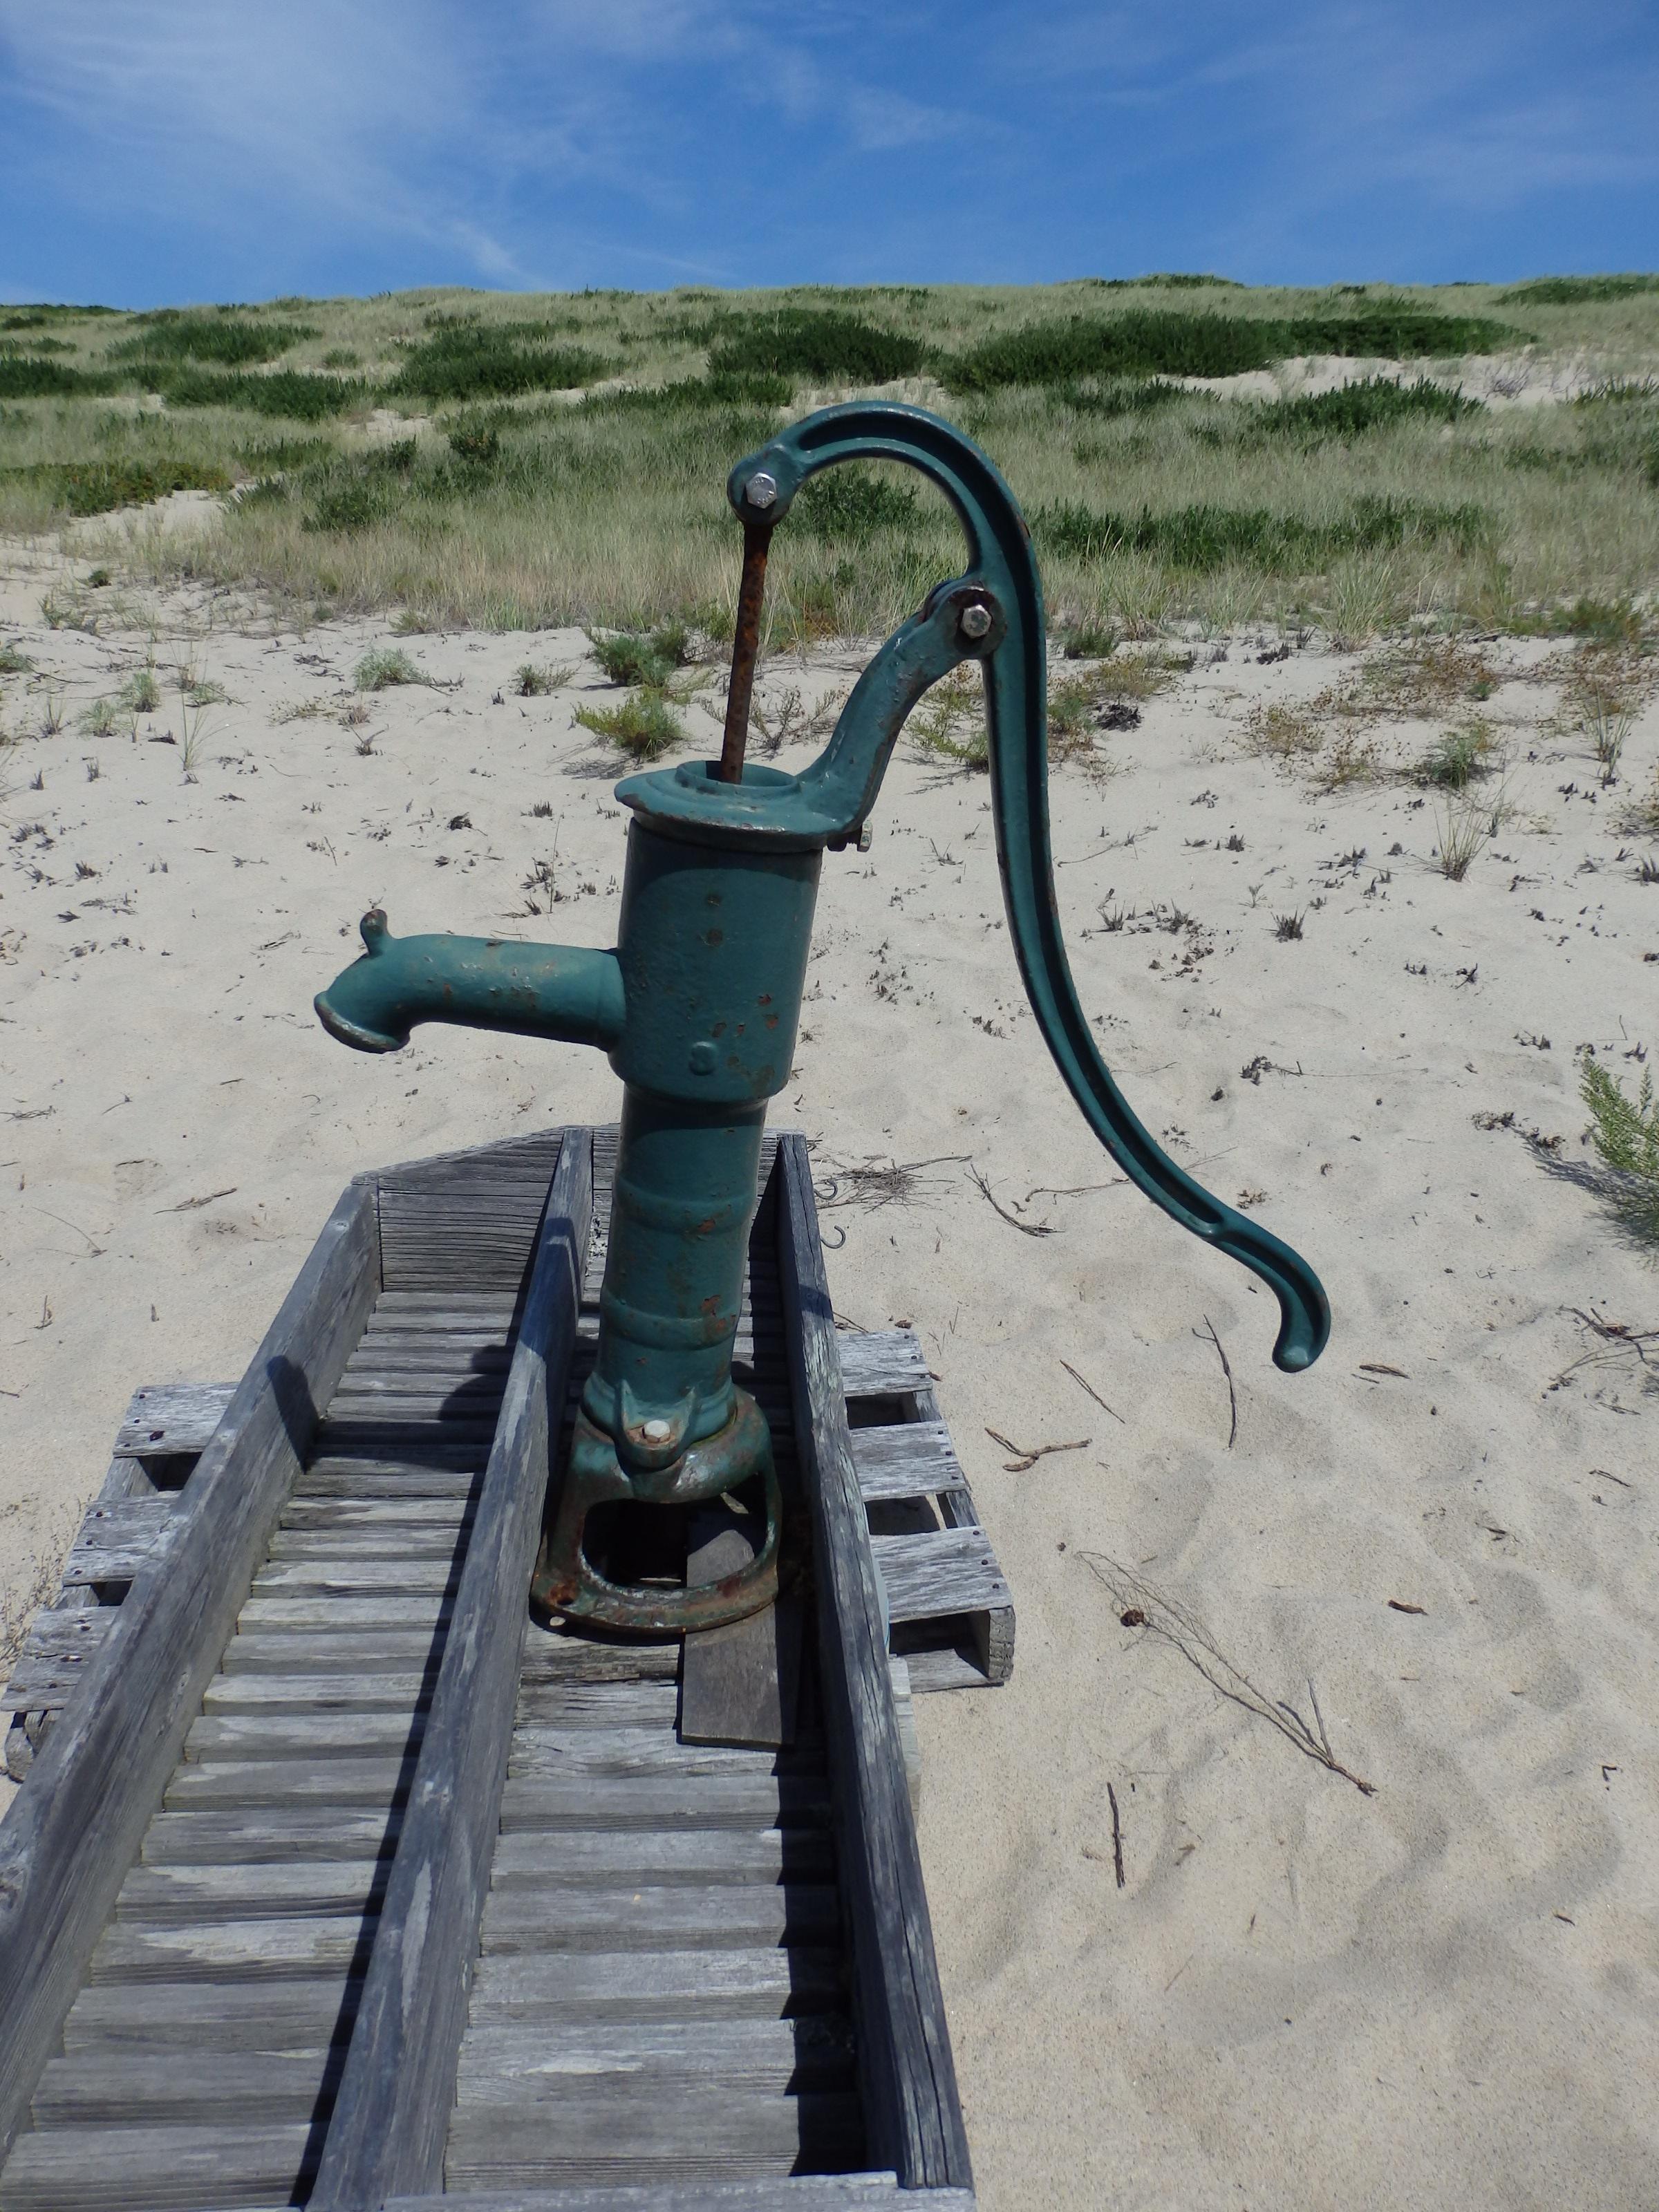 sea water sand vintage desert wind old rustic walkway material pump dunes well drought corrosion plumbing & Free Images : sea sand vintage desert wind old rustic walkway ...